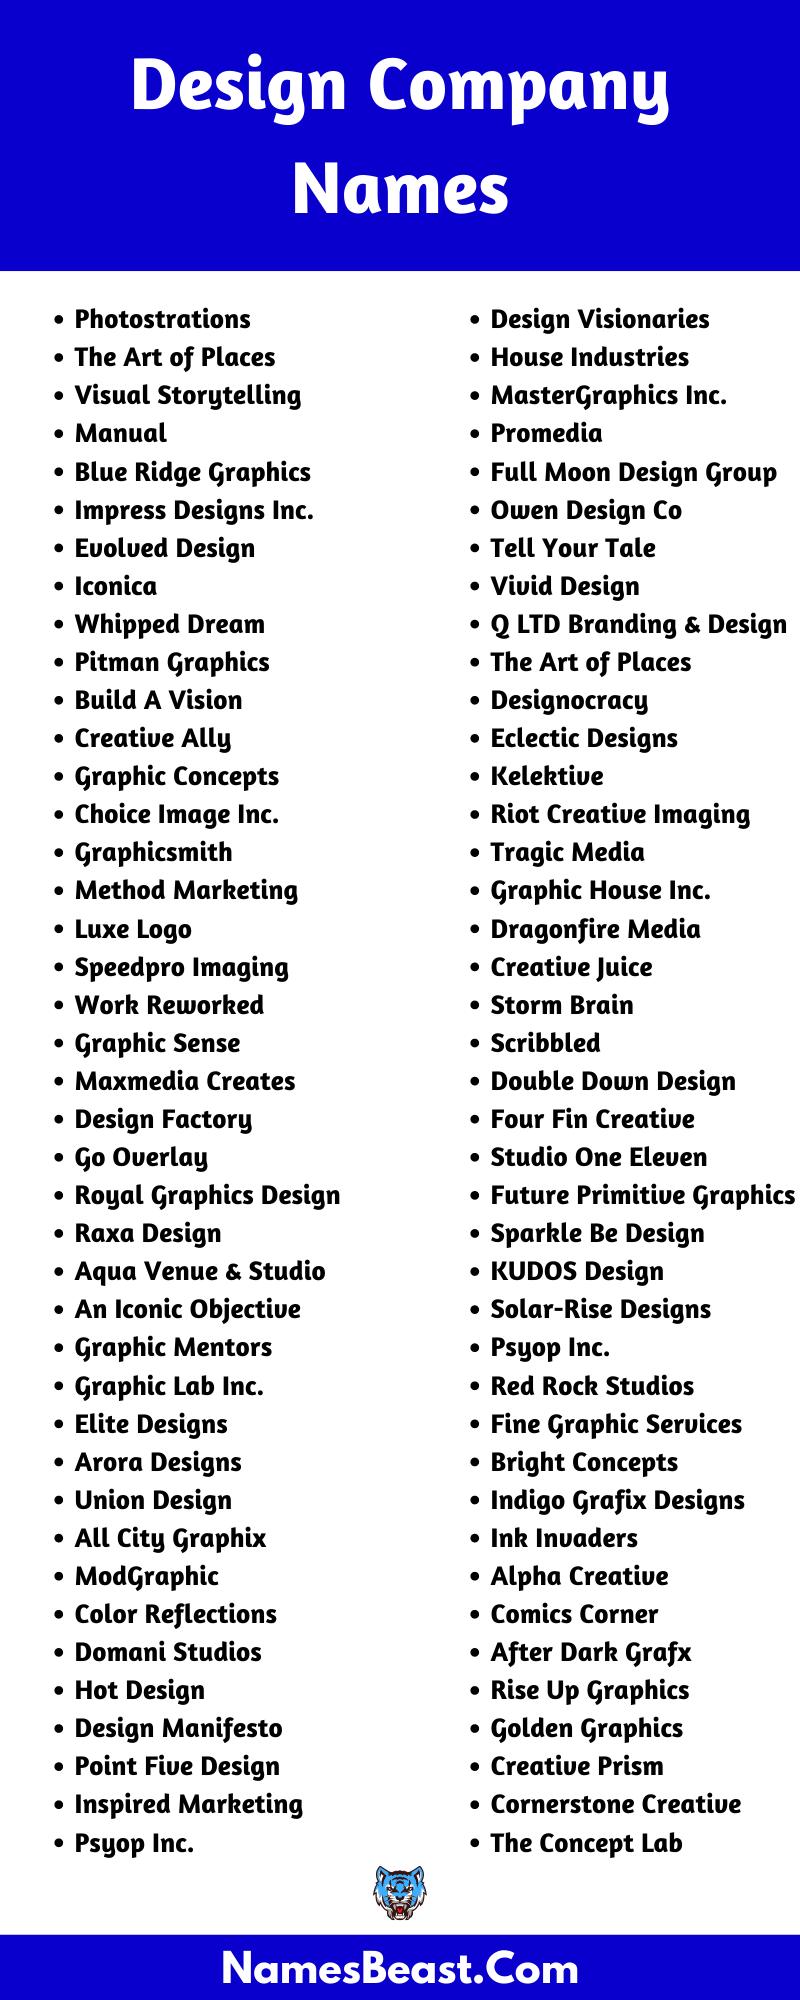 Design Company Names